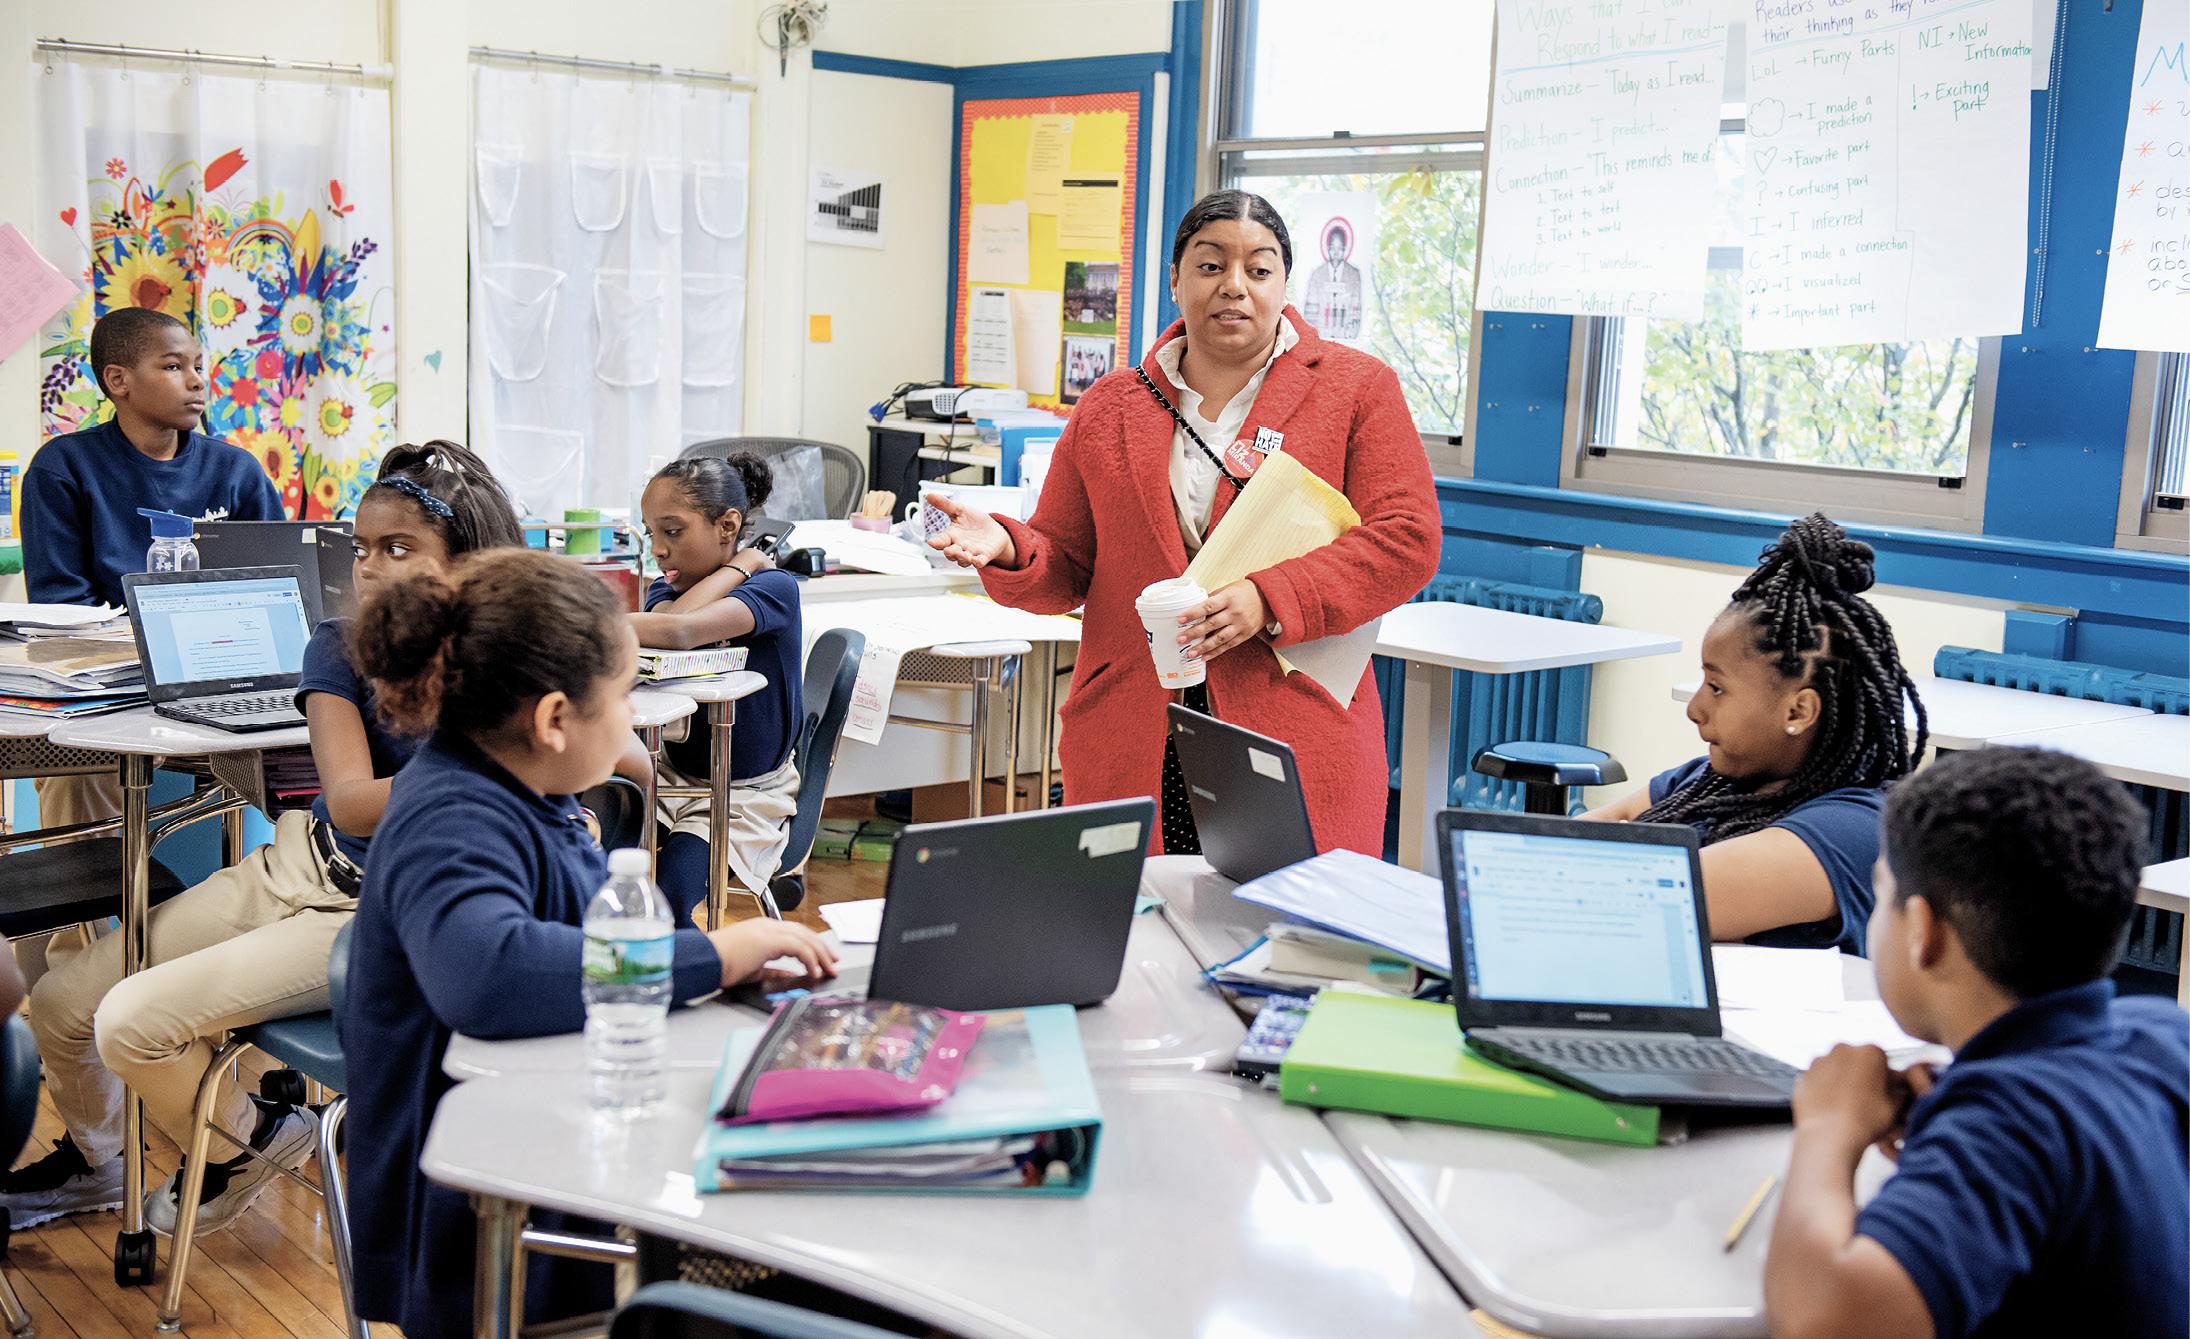 Miranda speaks with kids in her district